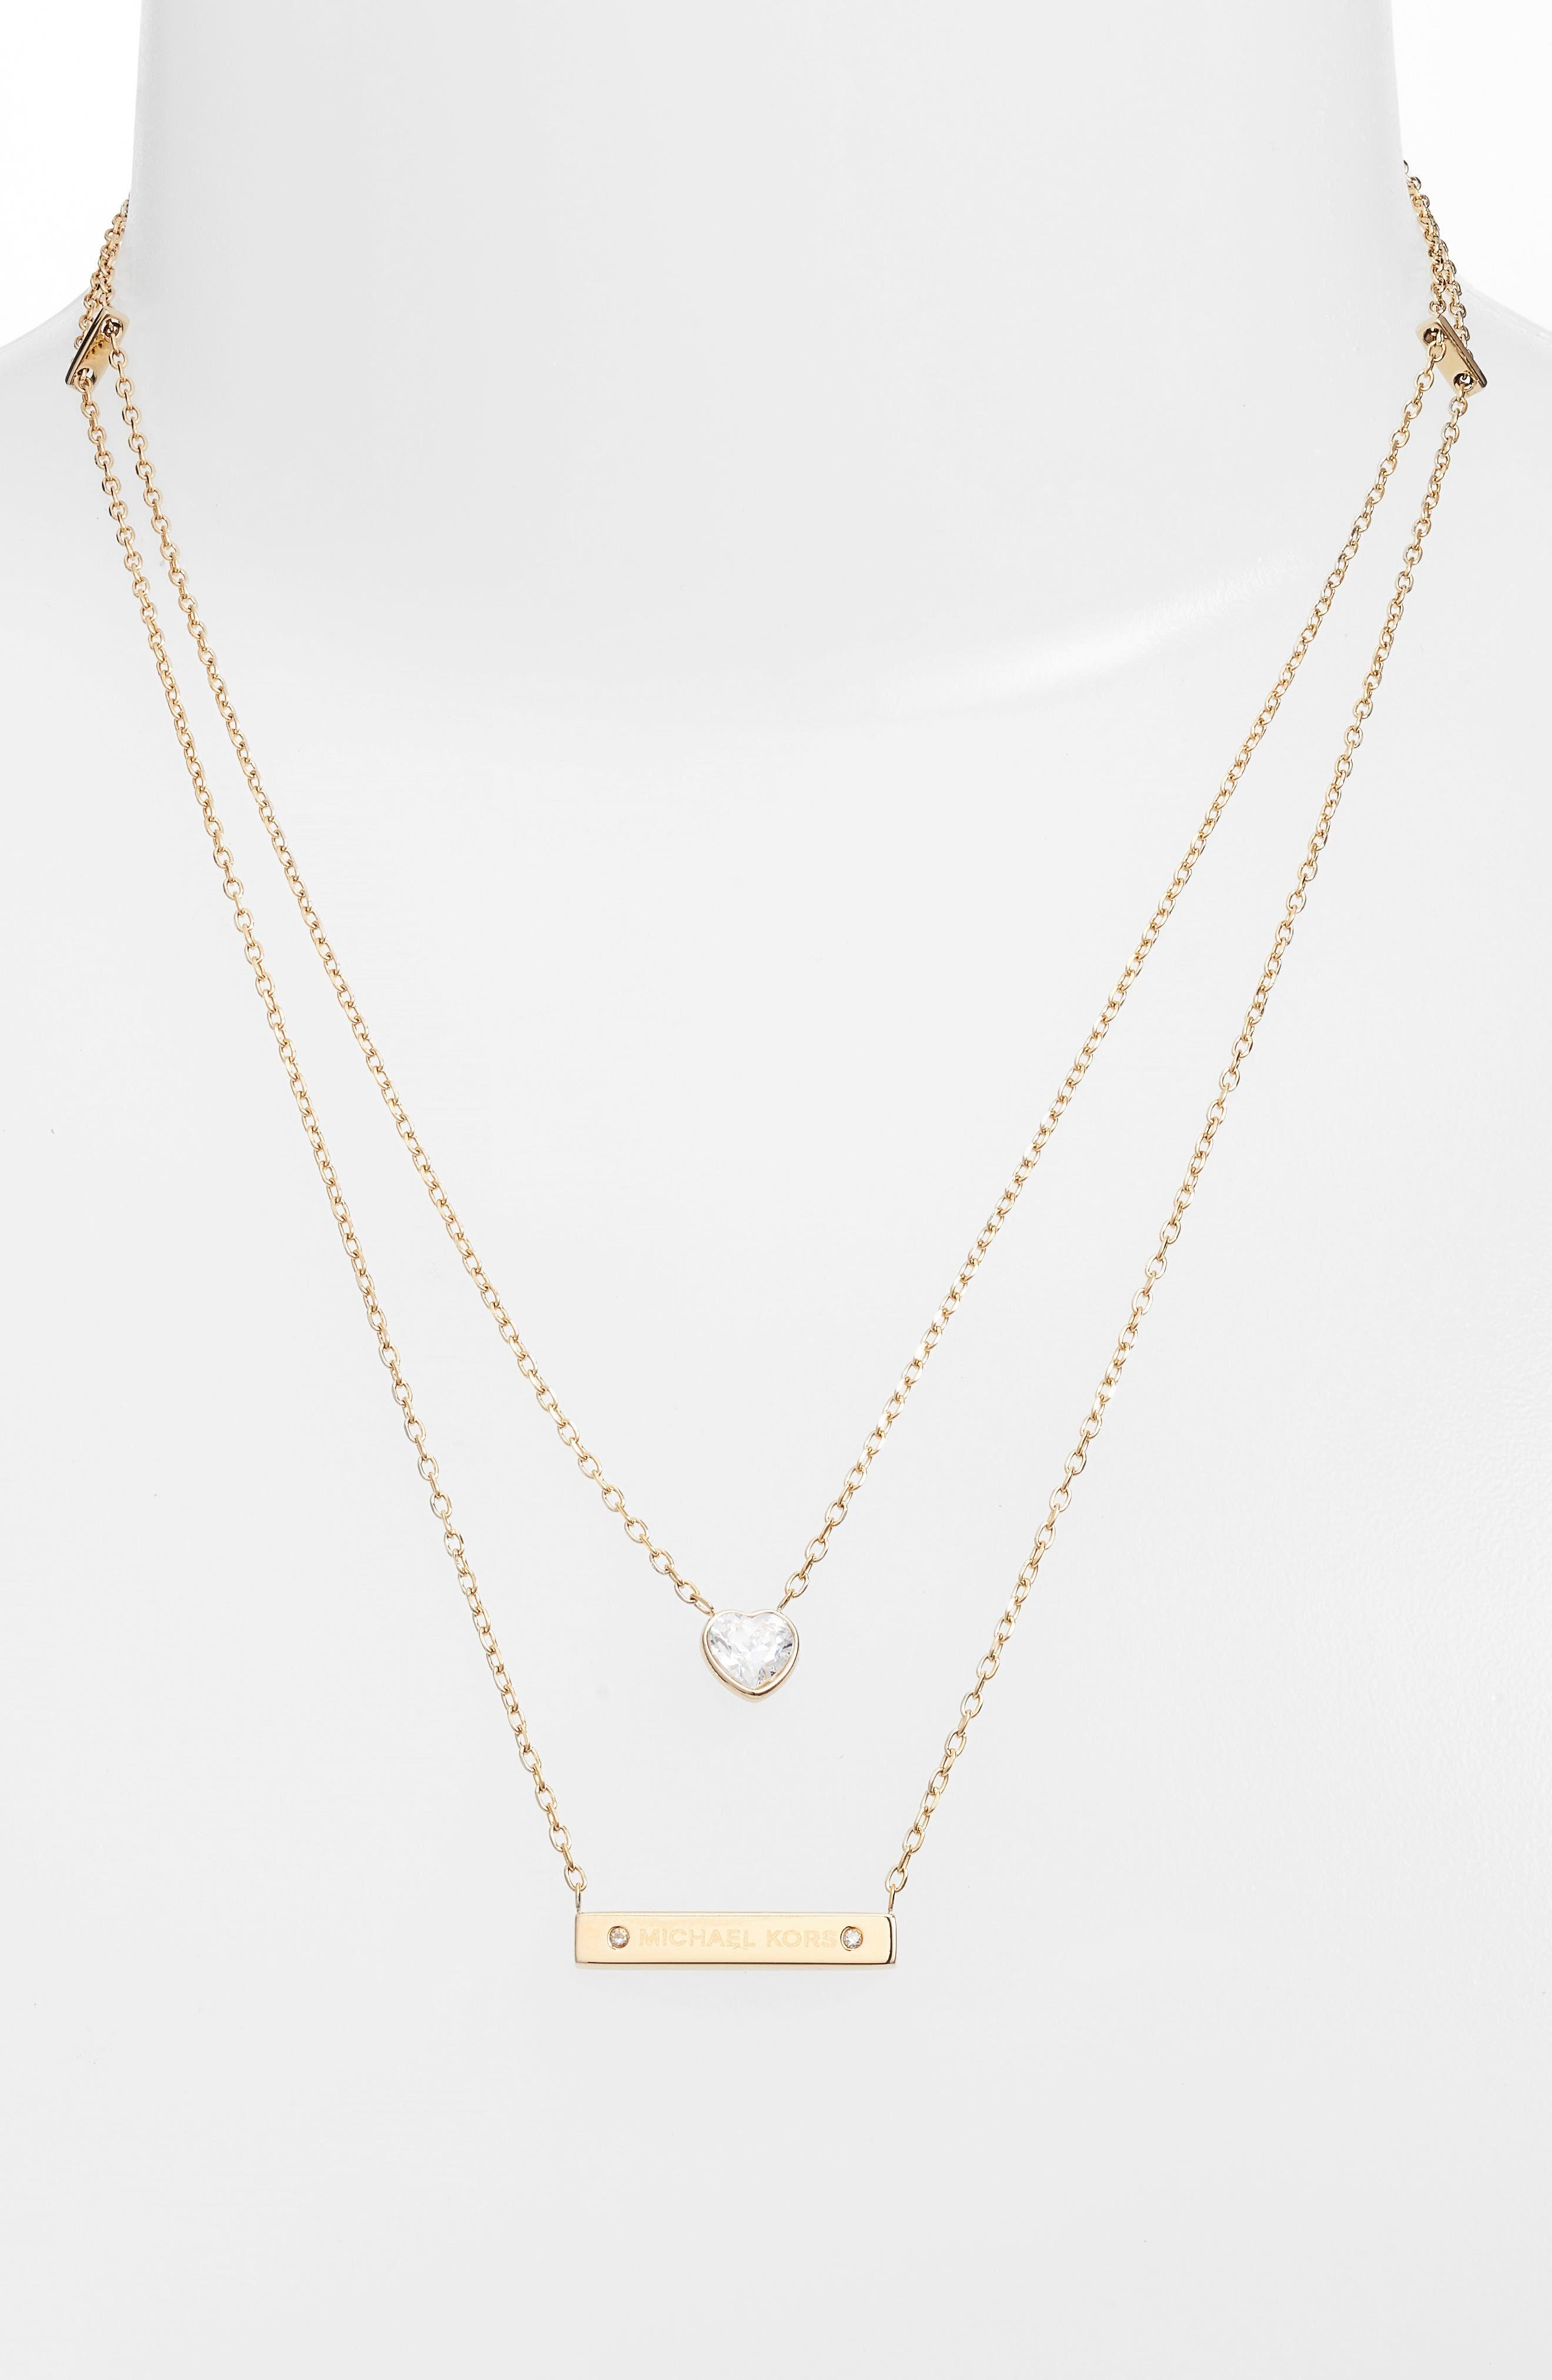 Main Image - Michael Kors Multistrand Pendant Necklace